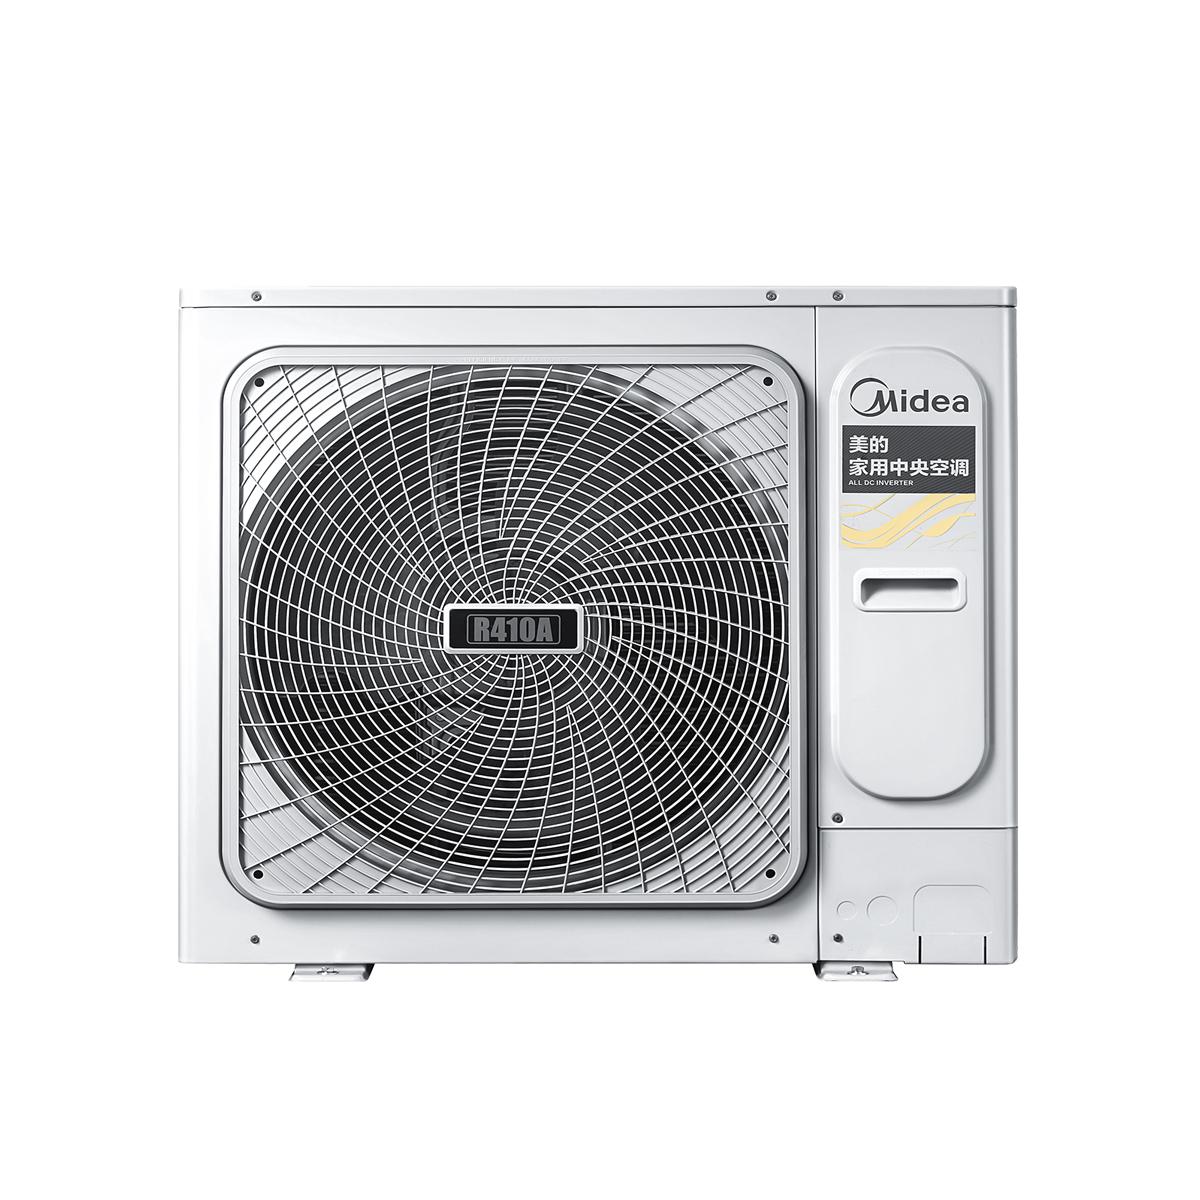 Midea/美的 MDVH-V120W/N1-5R1(E1)中央空调外机 说明书.pdf